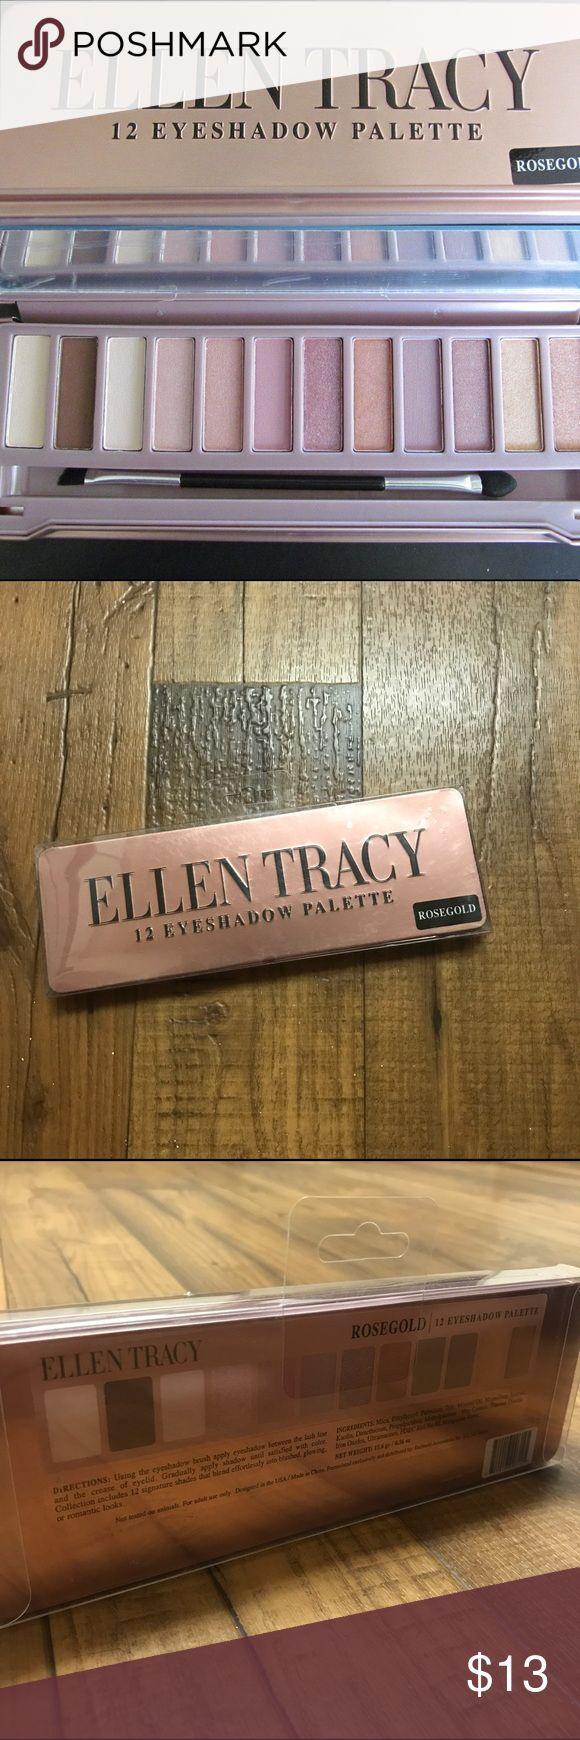 NWT Ellen Tracy Rose Gold 12 Eyeshadow Pallette New Sealed in original box 12 Eyeshadow Pallette  💲💲OFFERS WELCOME💲💲 ❌❌NO Trades❌❌ Ellen Tracy Makeup Eyeshadow